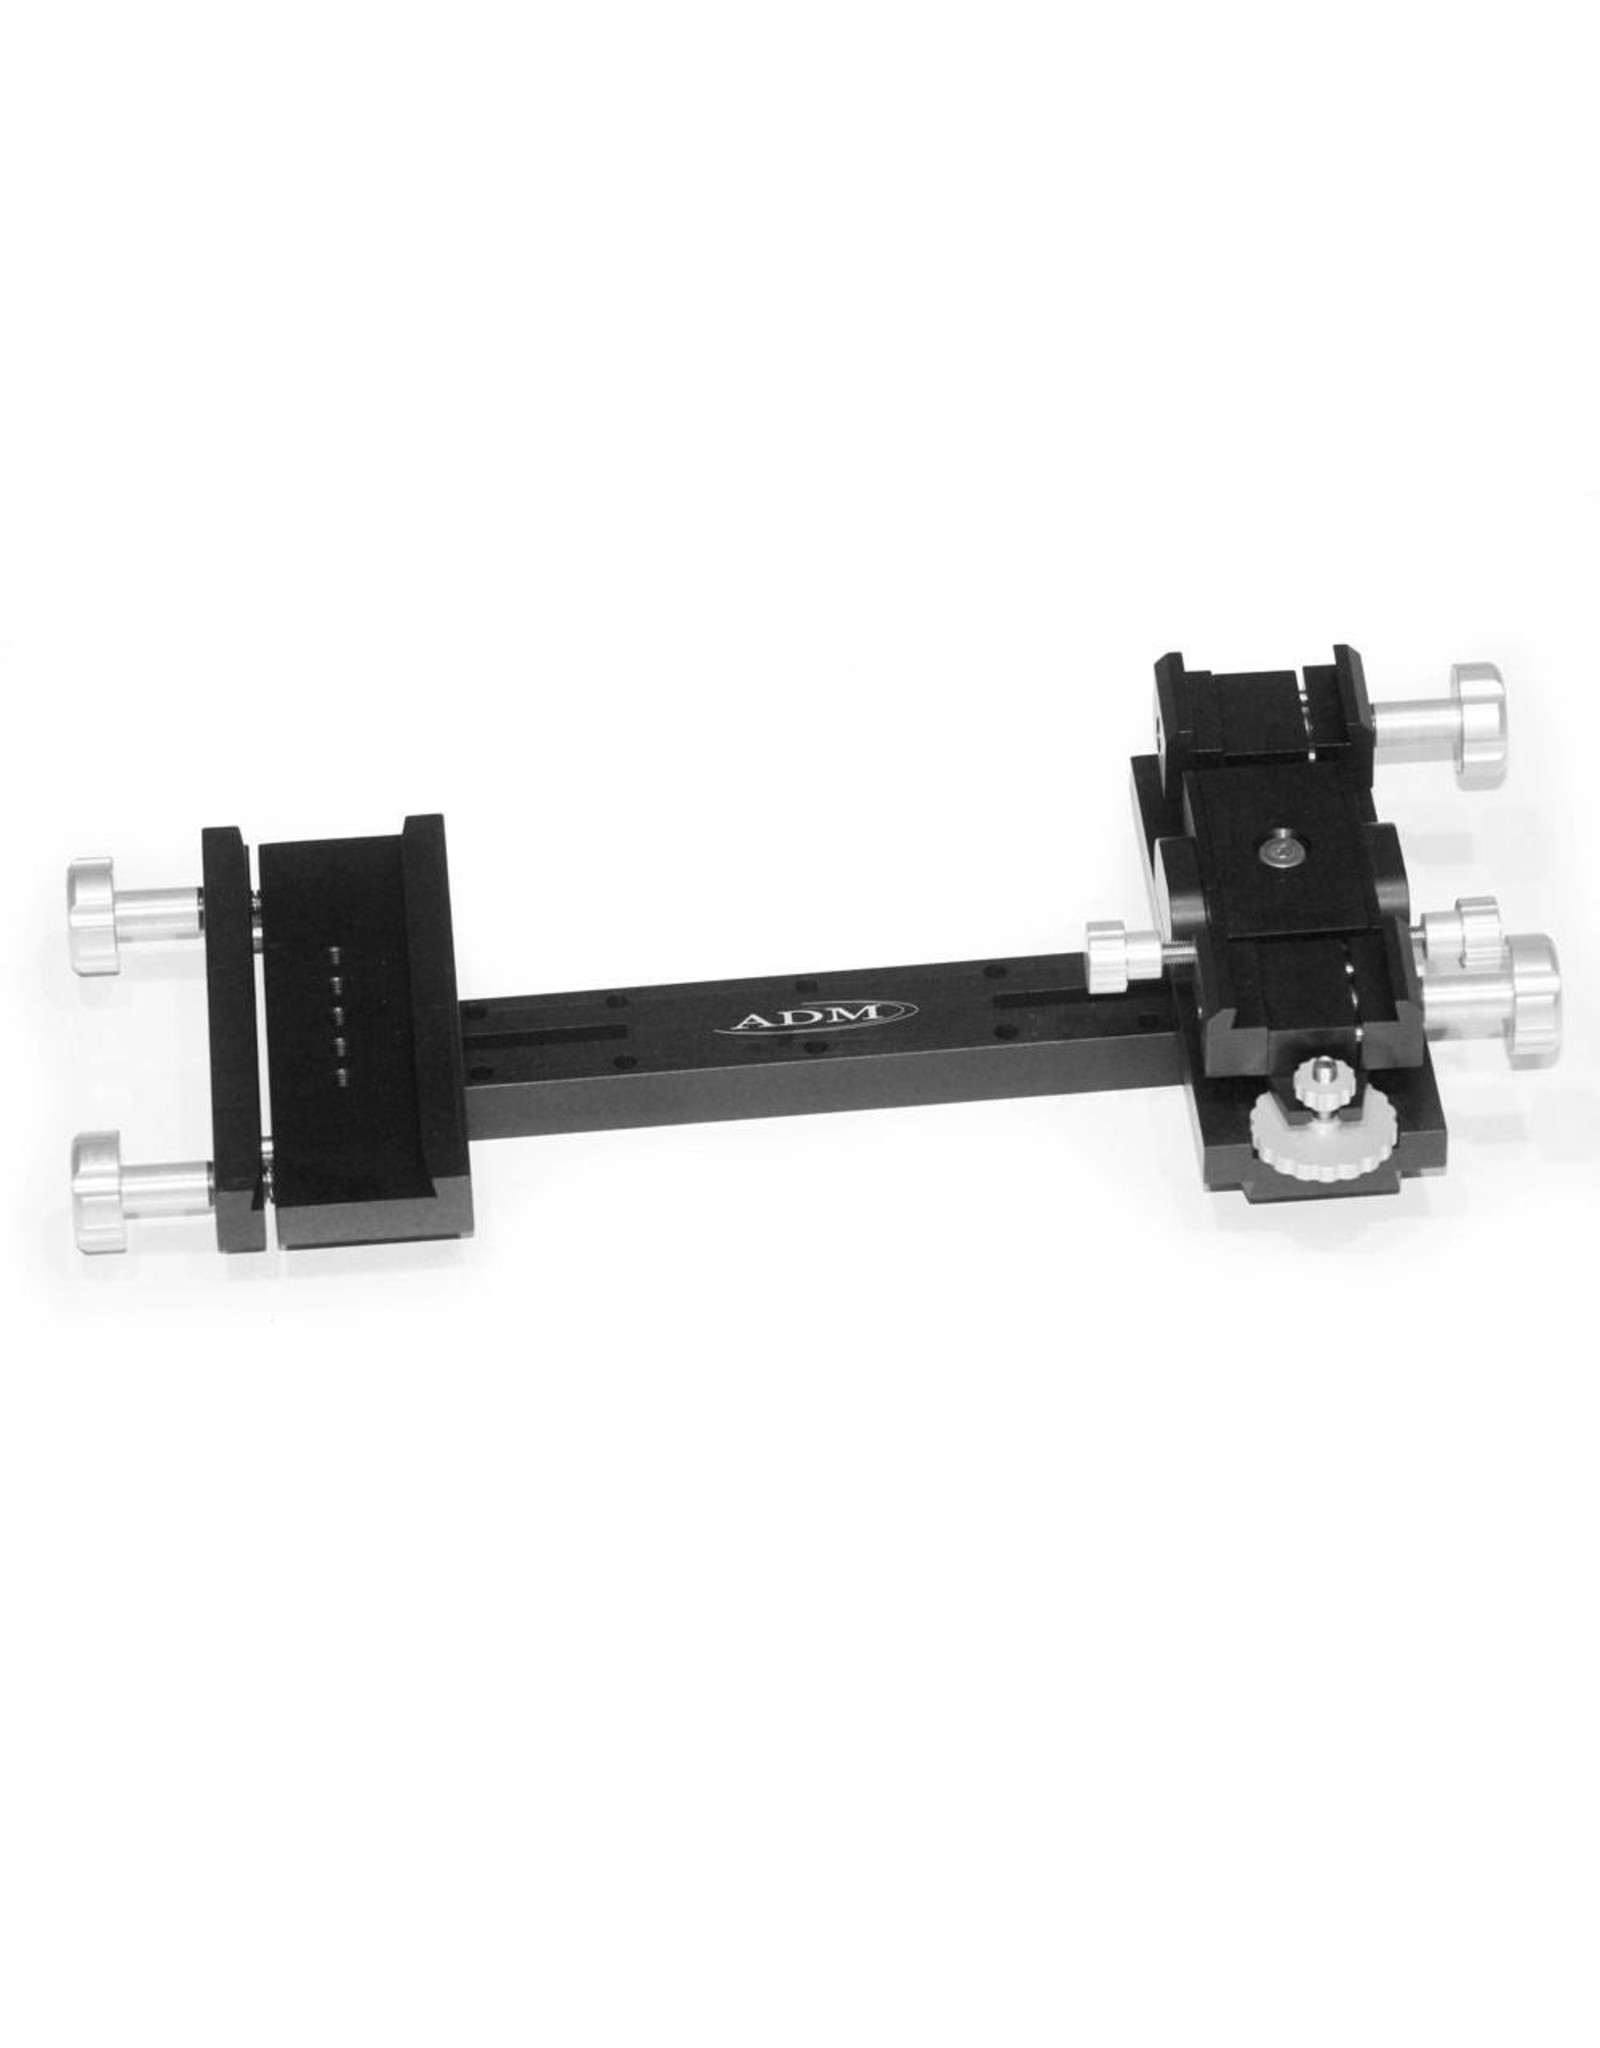 ADM ADM Mini-MAX ALT/AZ Aiming Device Female Saddle Version